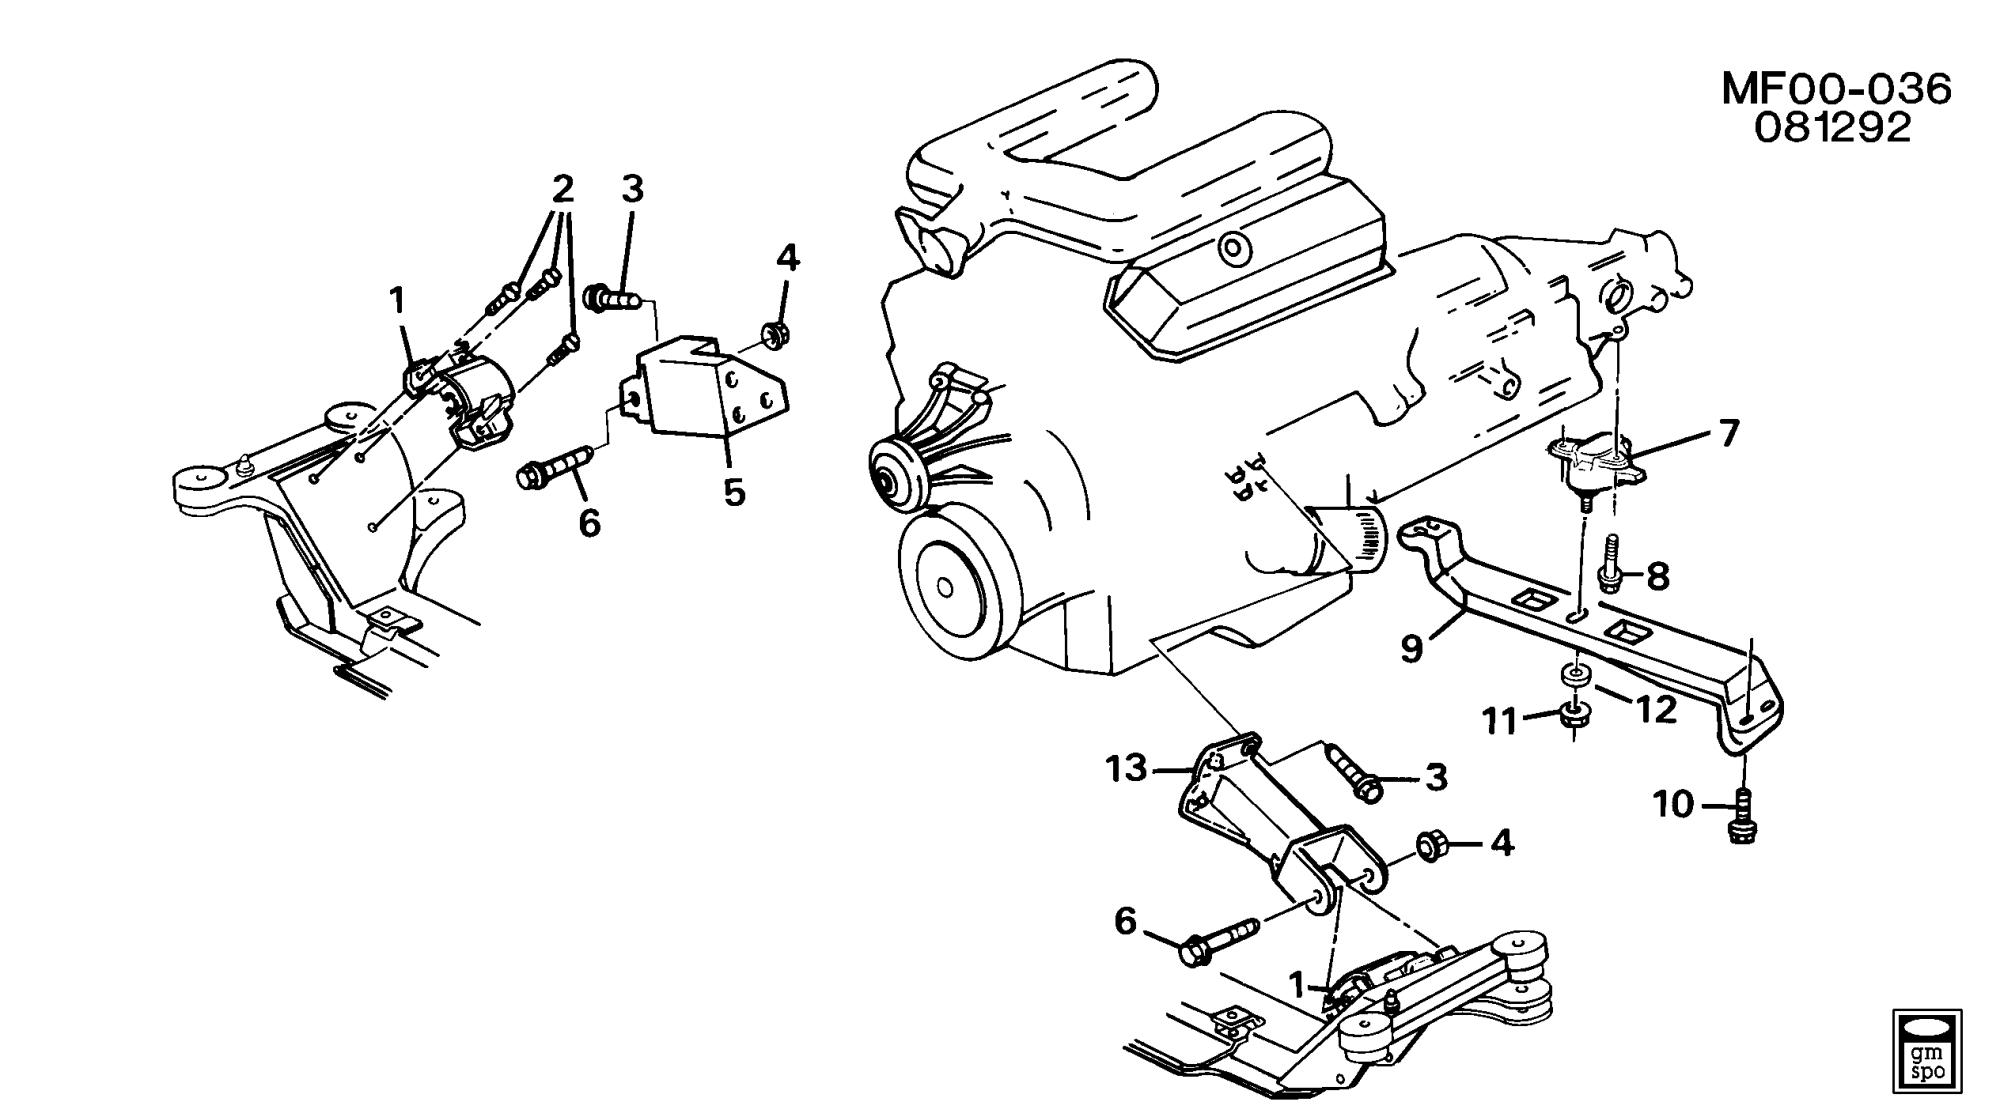 hight resolution of 1995 chevy camaro fuse box diagram